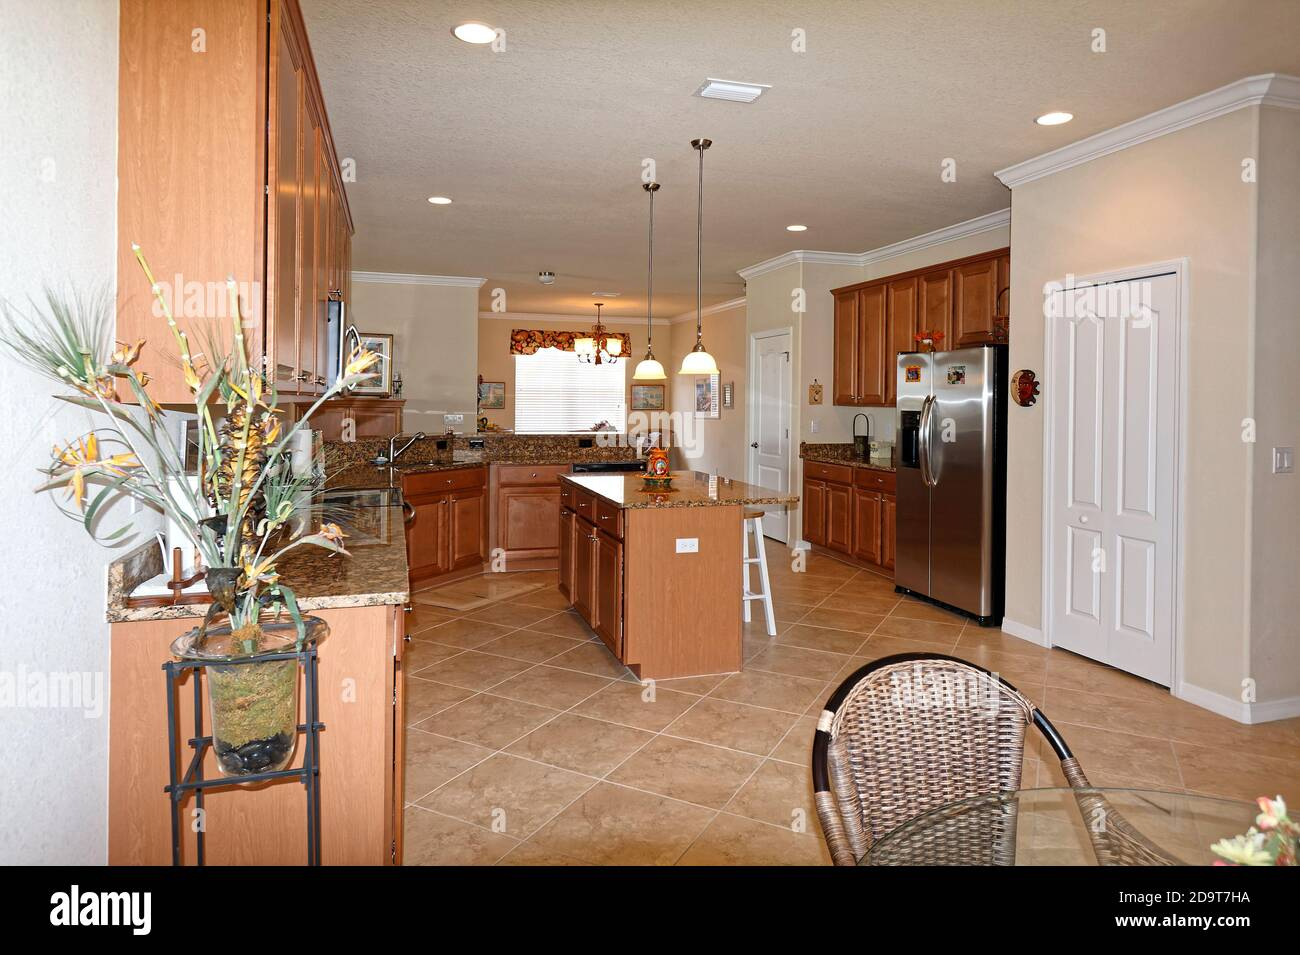 large modern kitchen, granite counters, center island, wood cabinets, recessed lighting, hanging lights, tile floor, set on diagonal, window, valance, Stock Photo